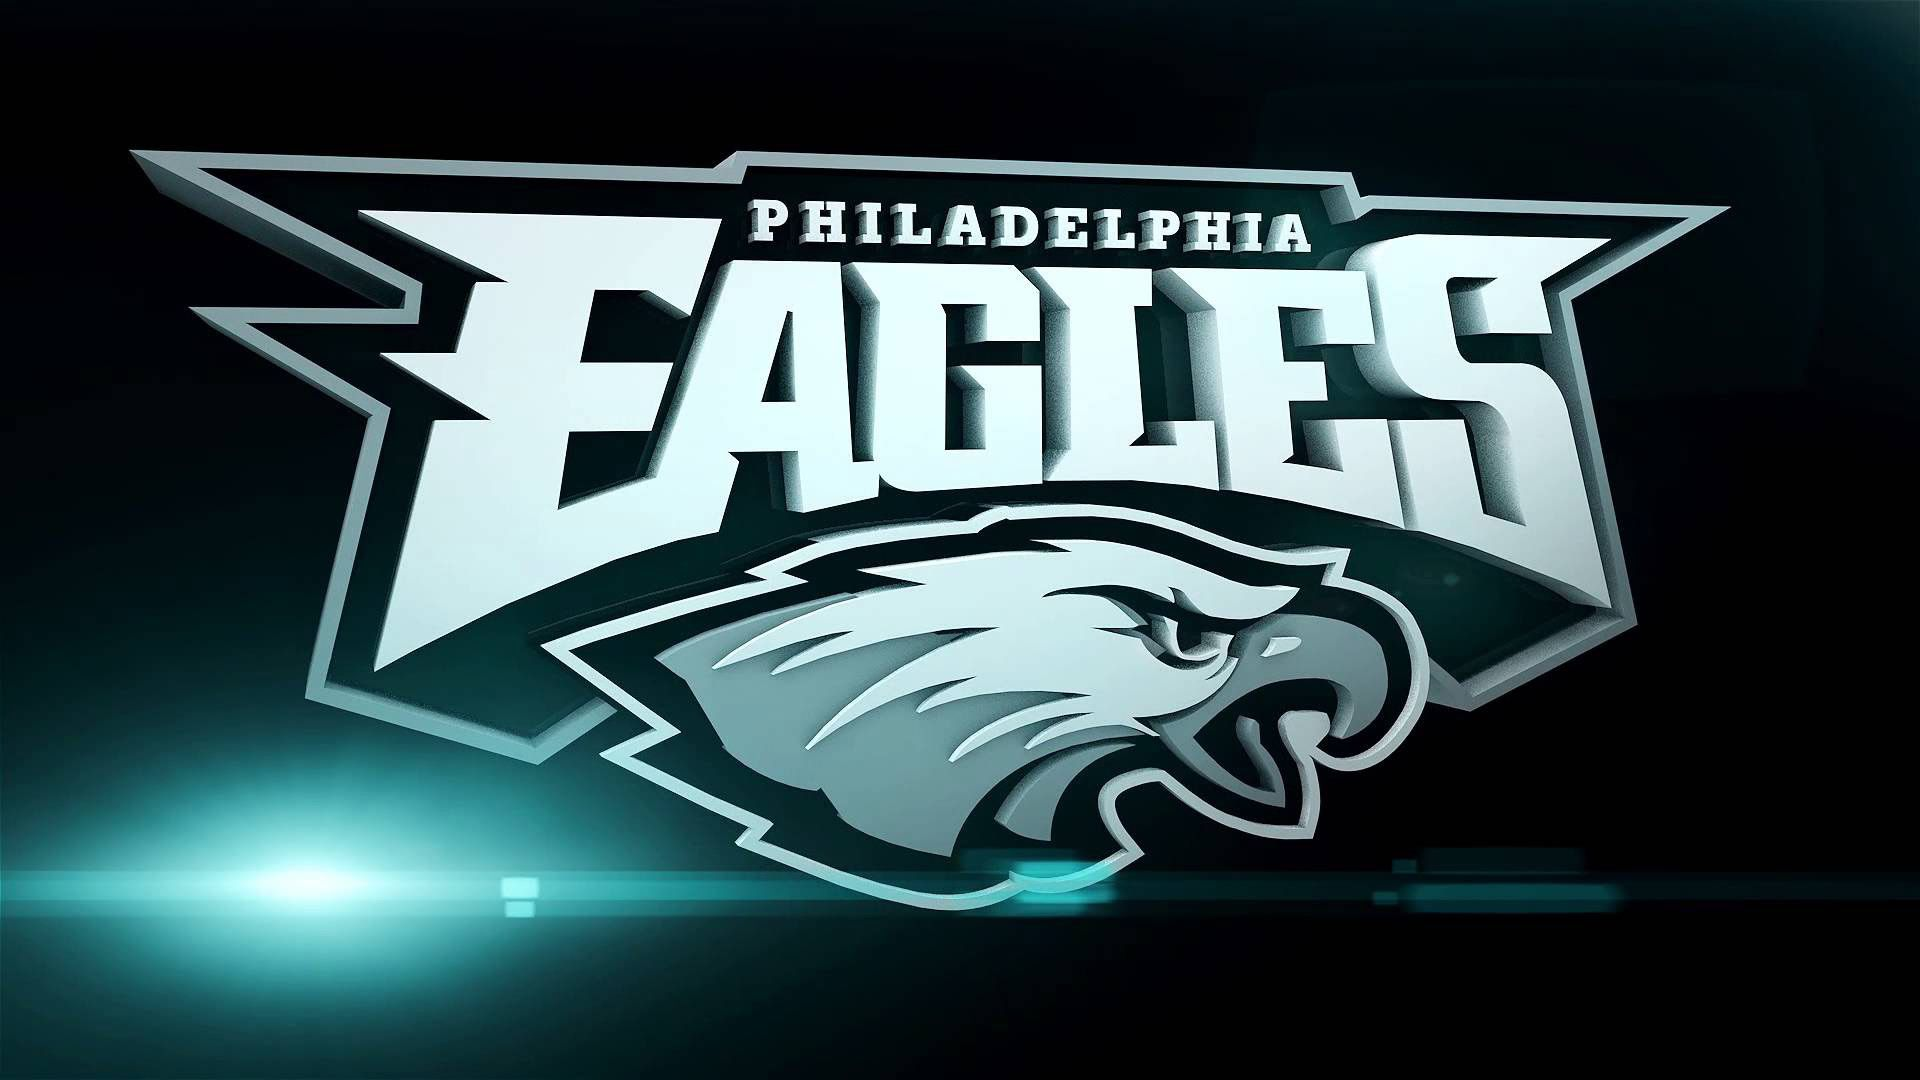 Philadelphia Eagles Screensavers Wallpaper HD Wallpapers